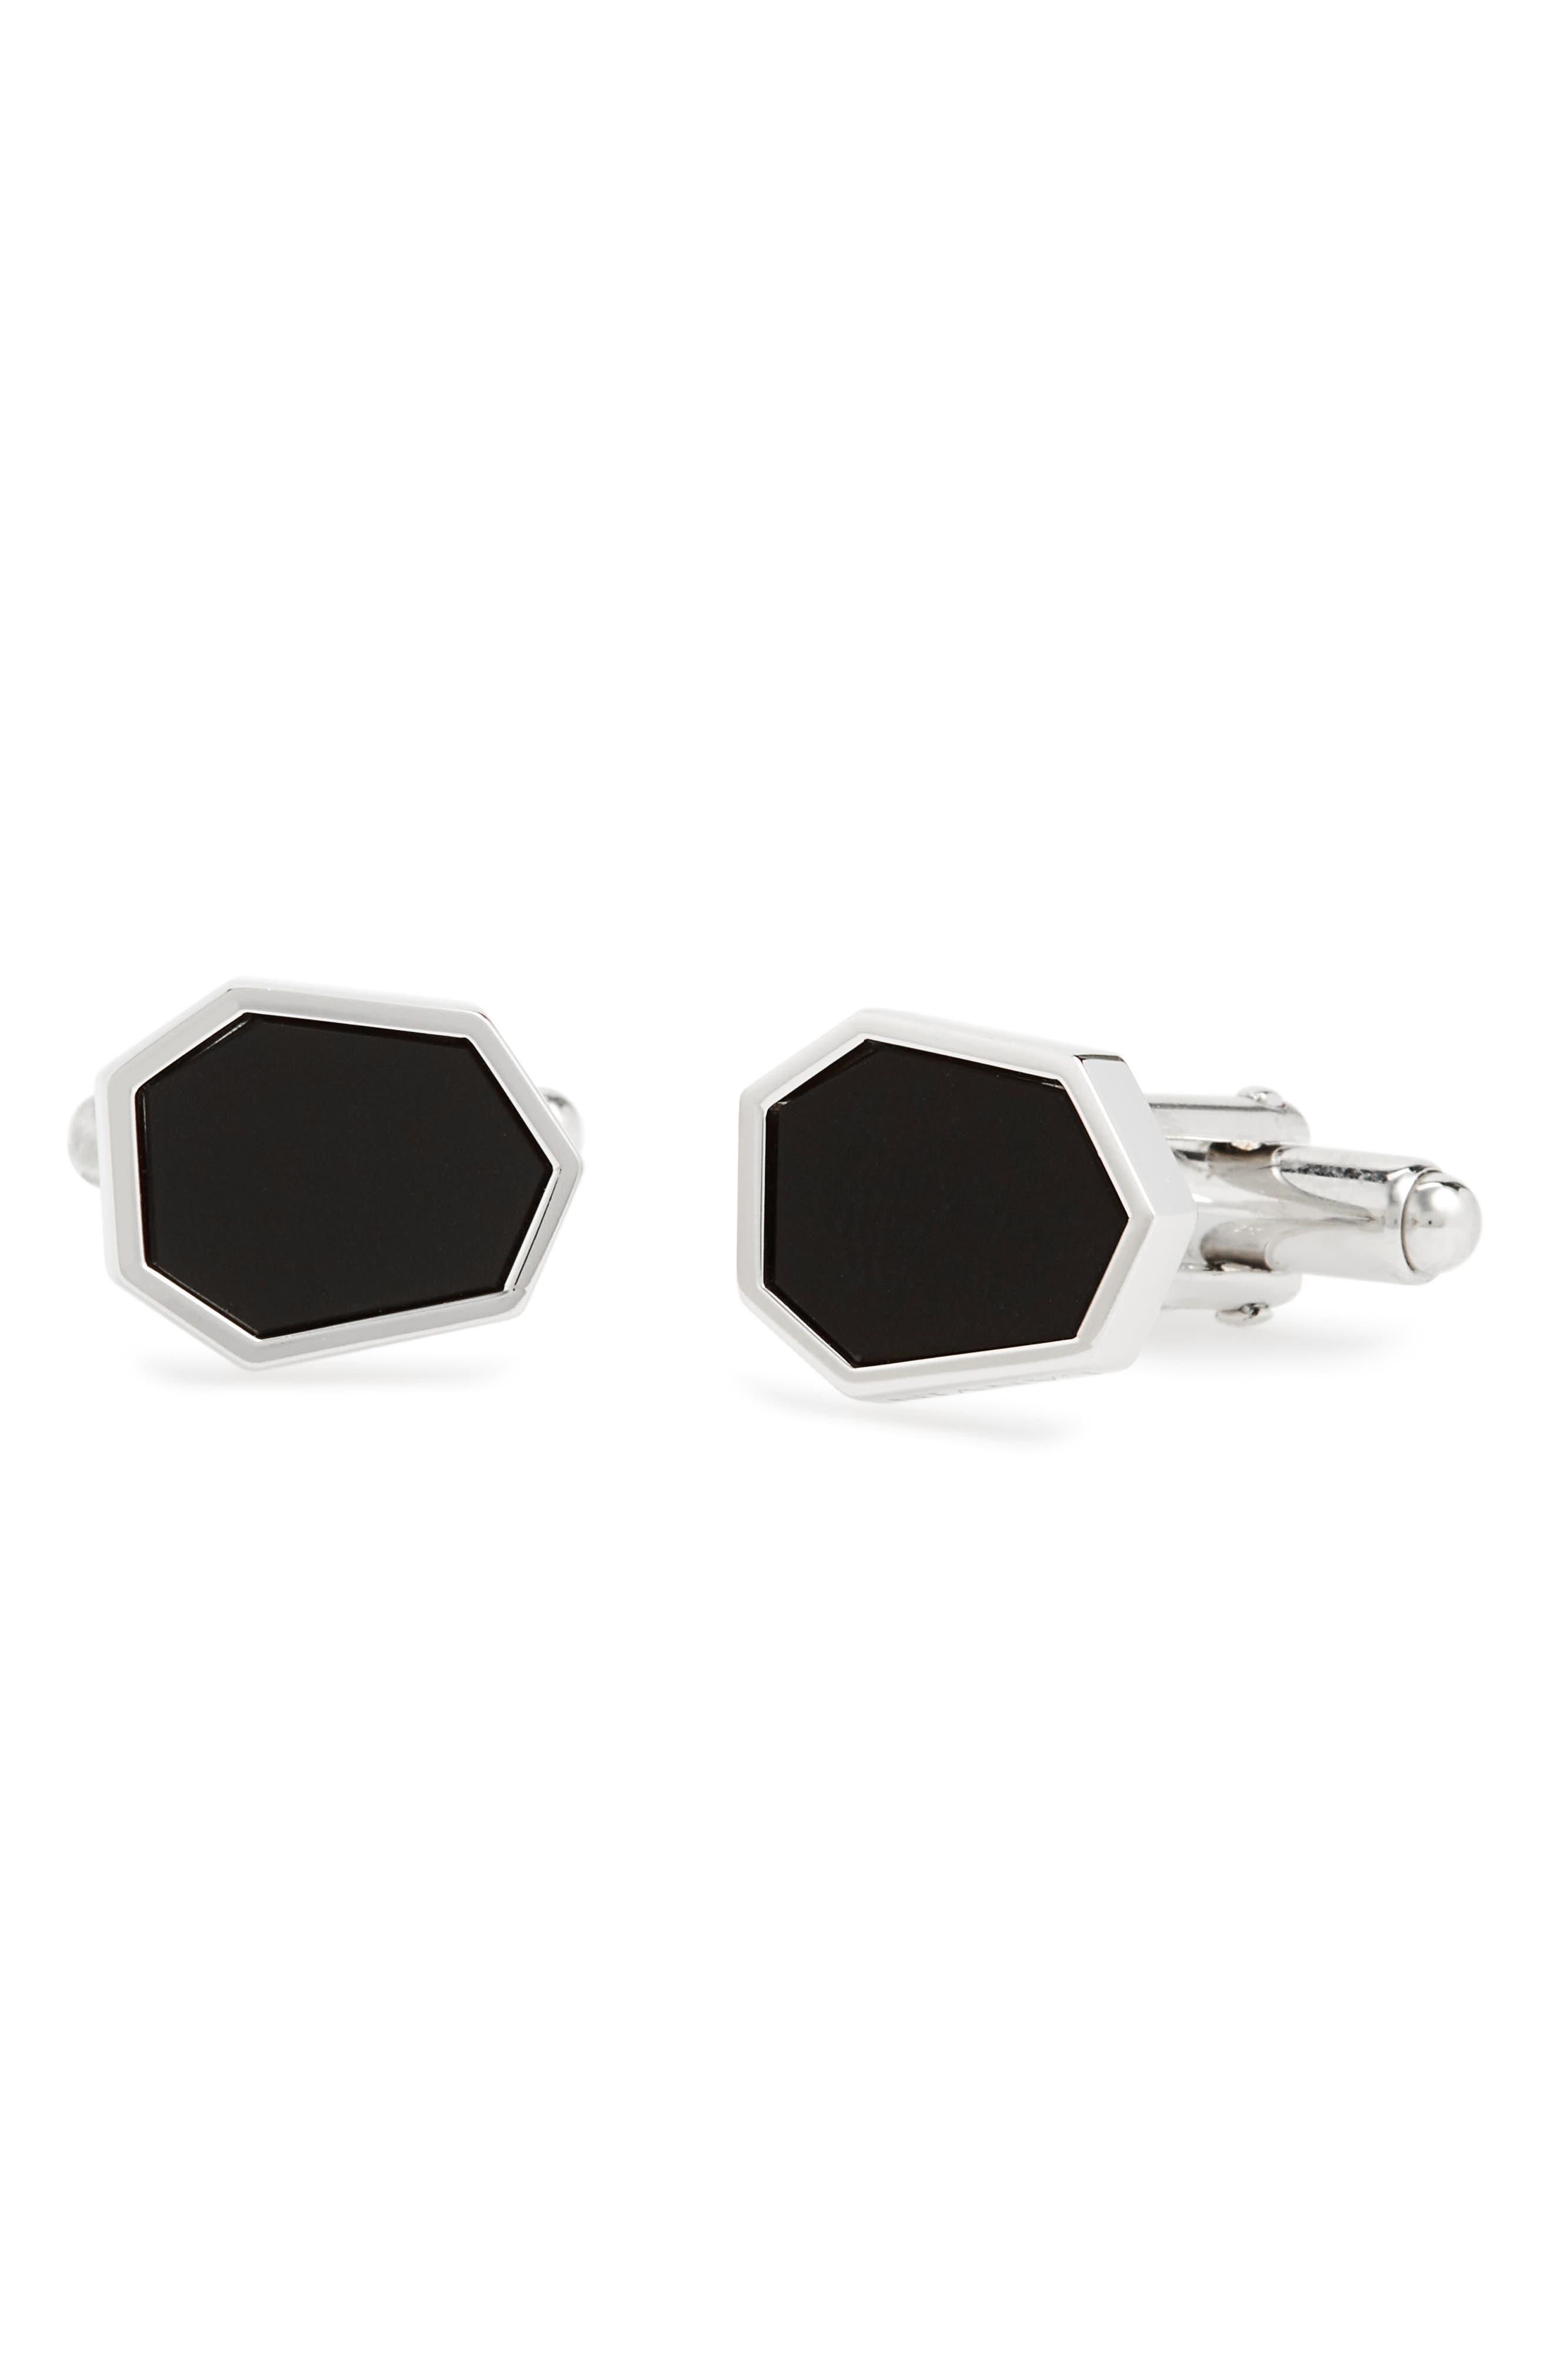 Lanvin Polygon Onyx Cuff Links